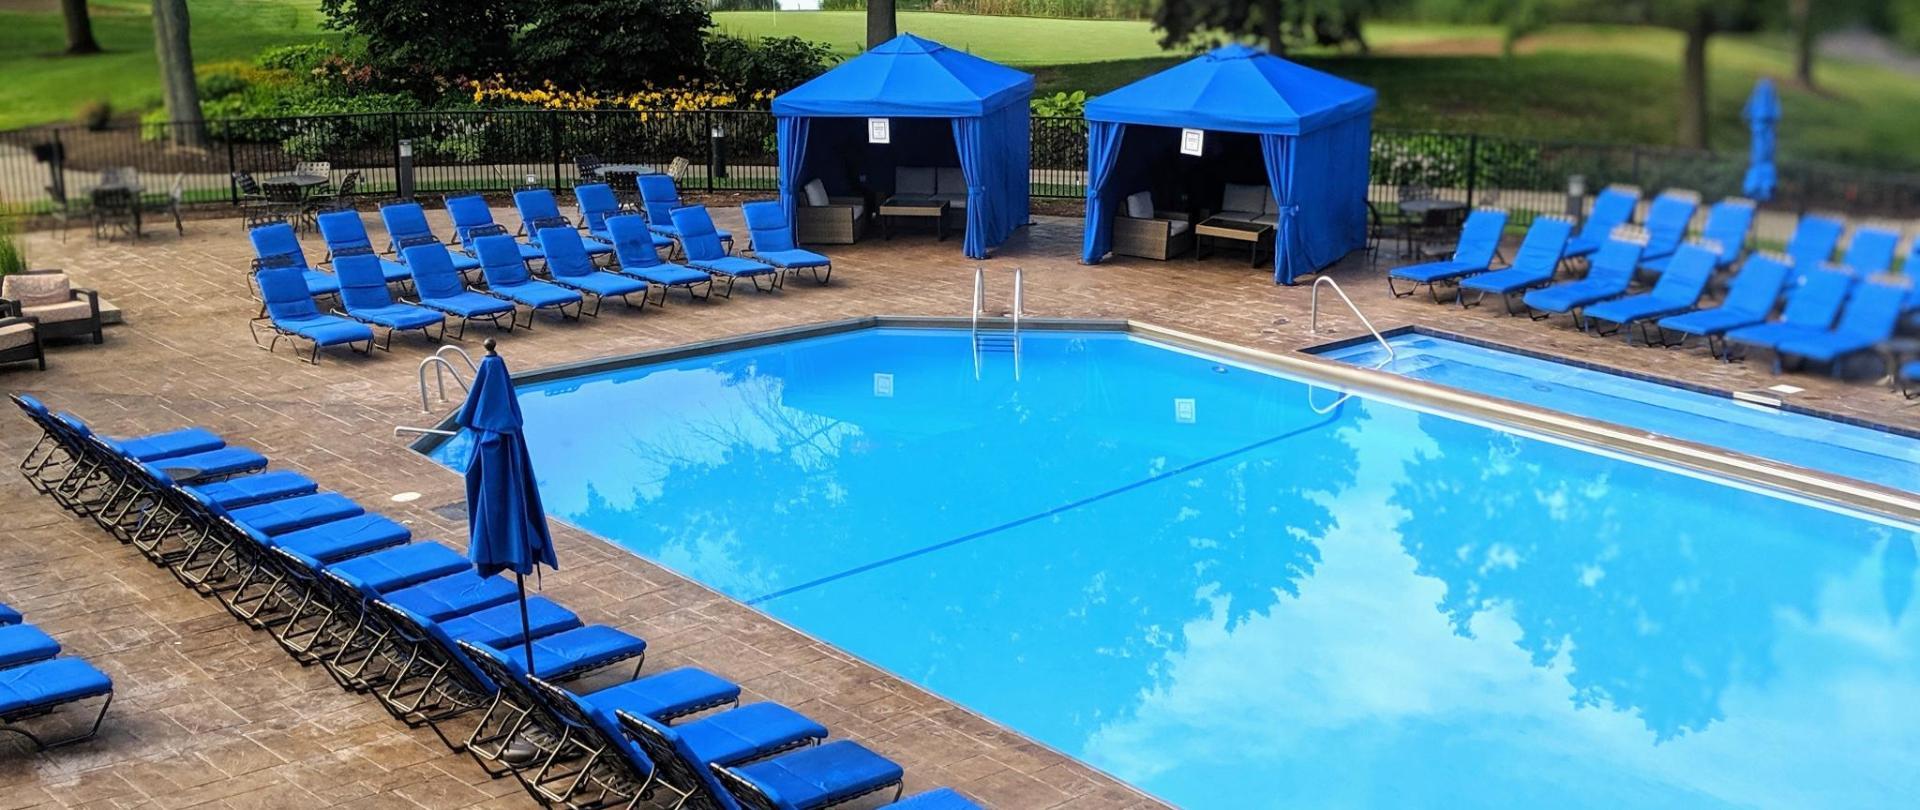 Monarch pool and cabanas 1.jpg